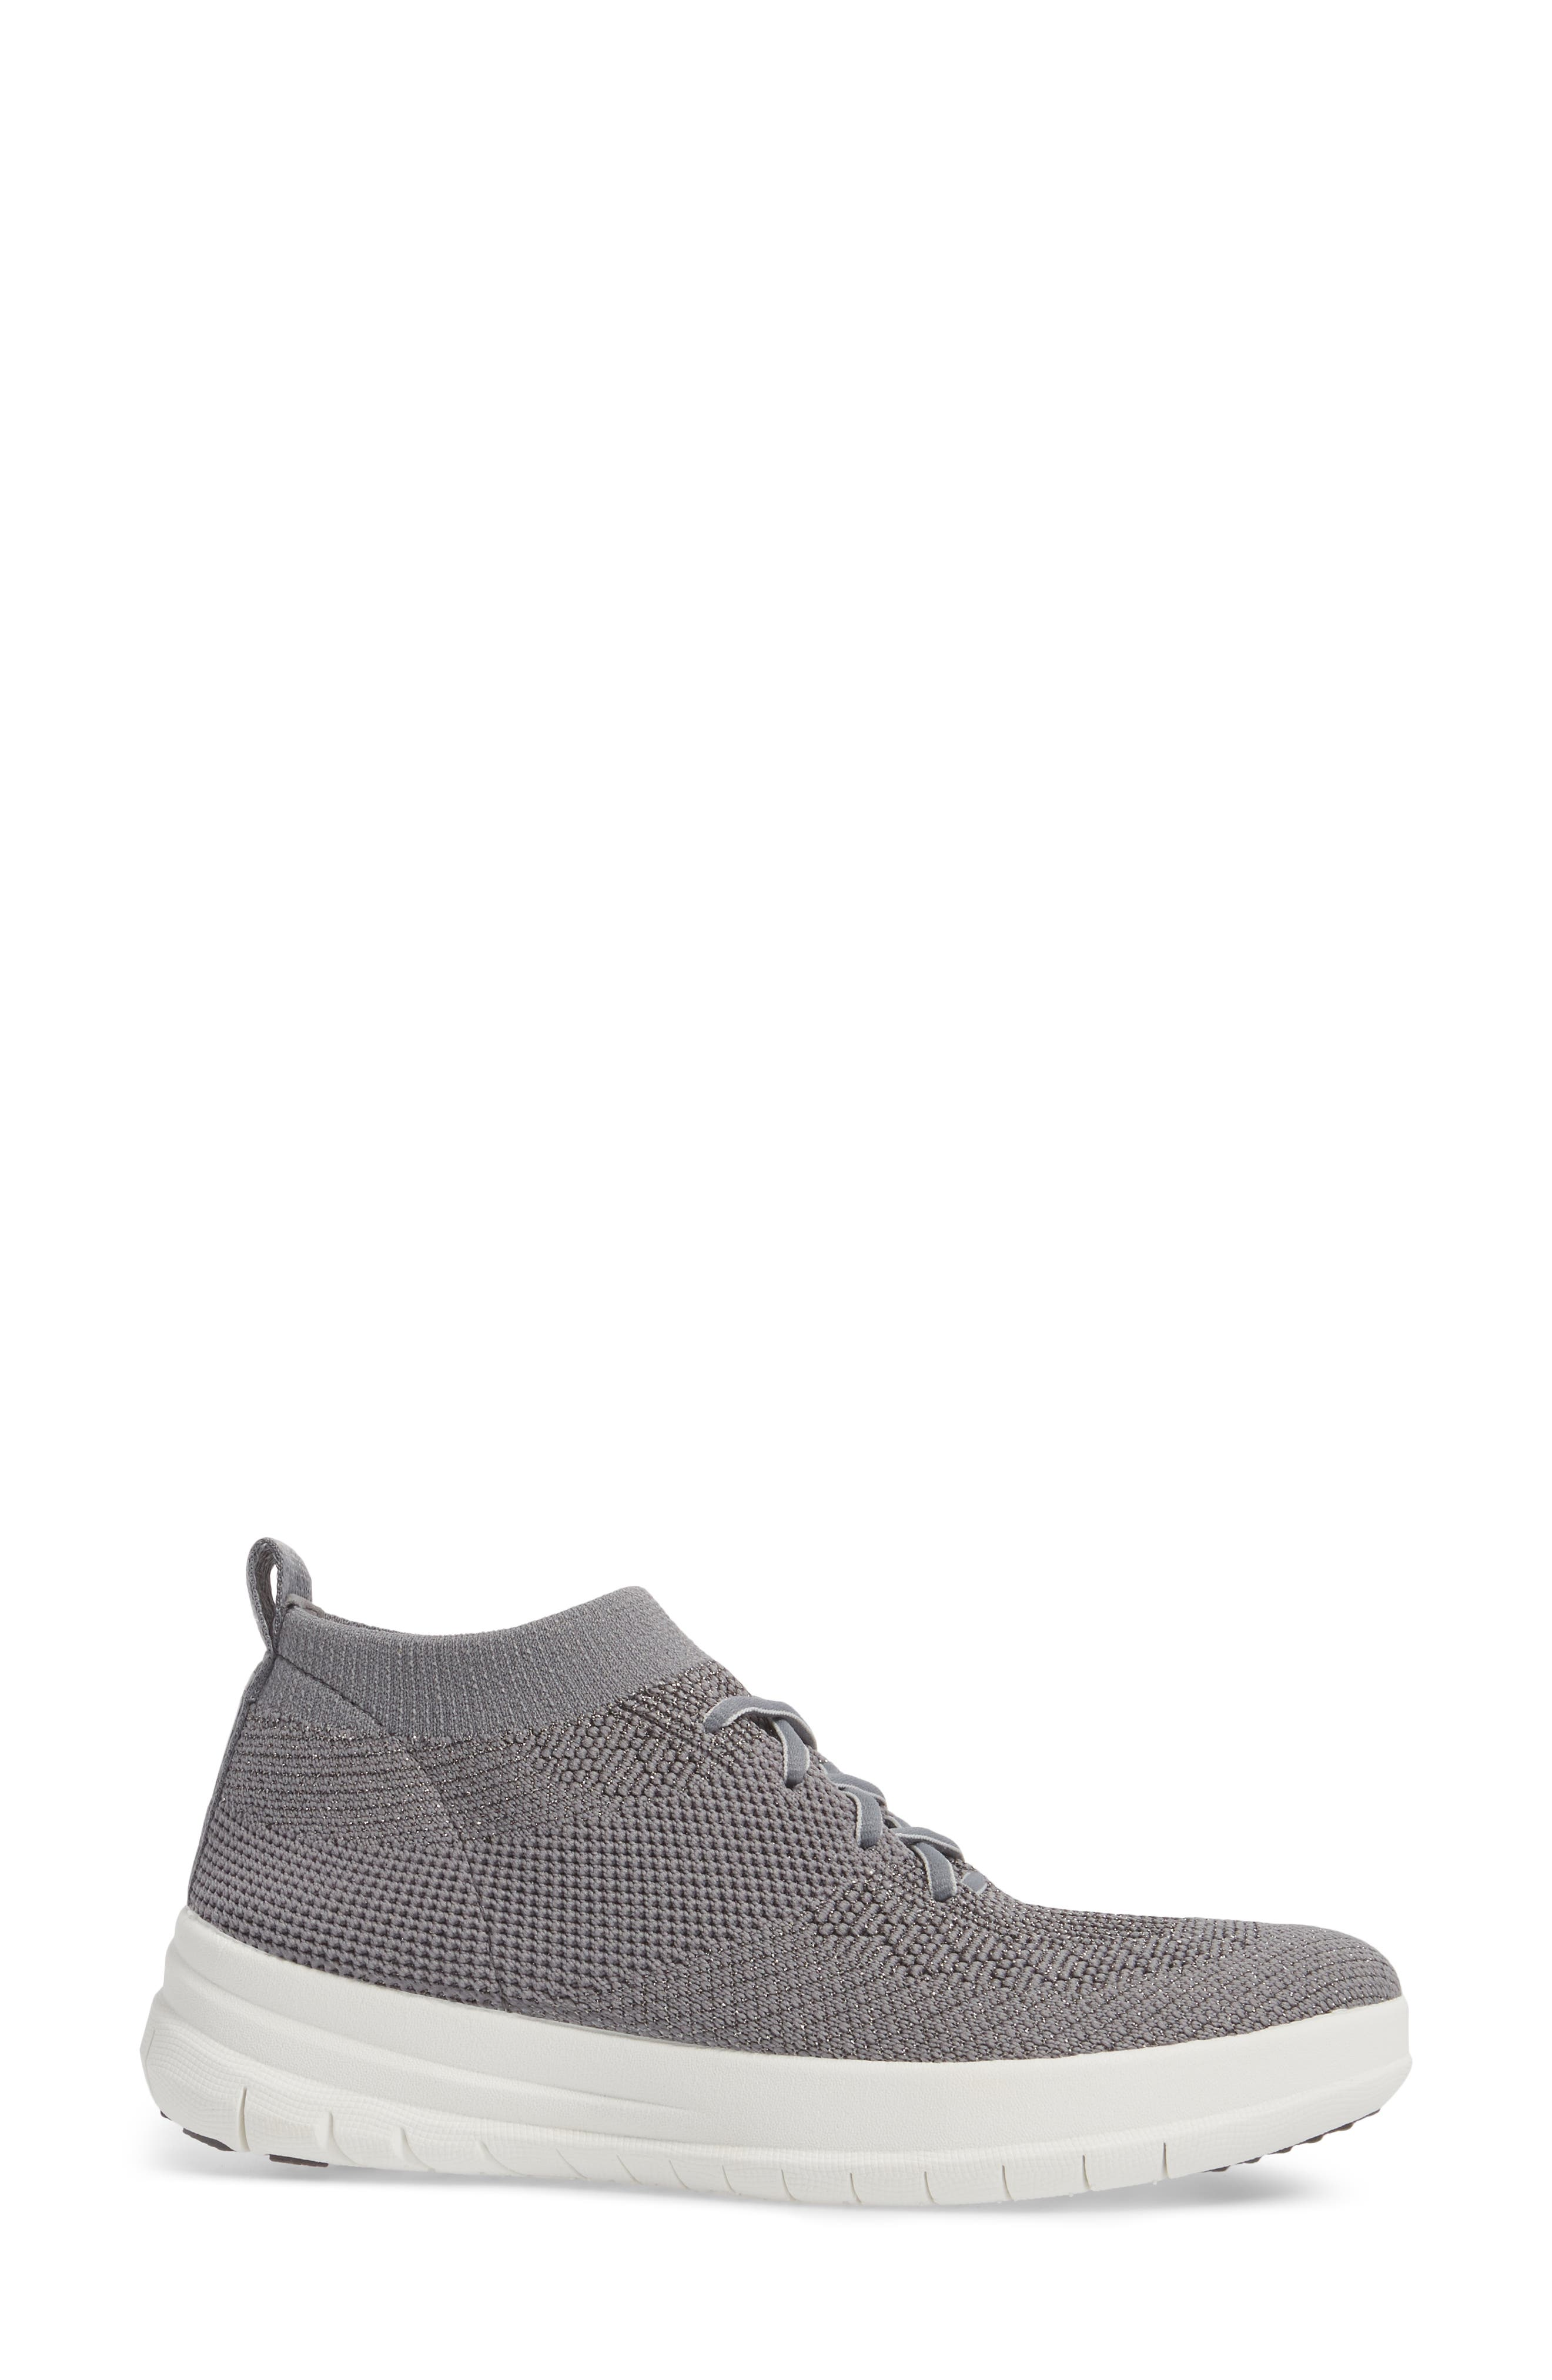 Uberknit<sup>™</sup> Slip-On High-Top Sneaker,                             Alternate thumbnail 3, color,                             Charcoal/ Metallic Pewter